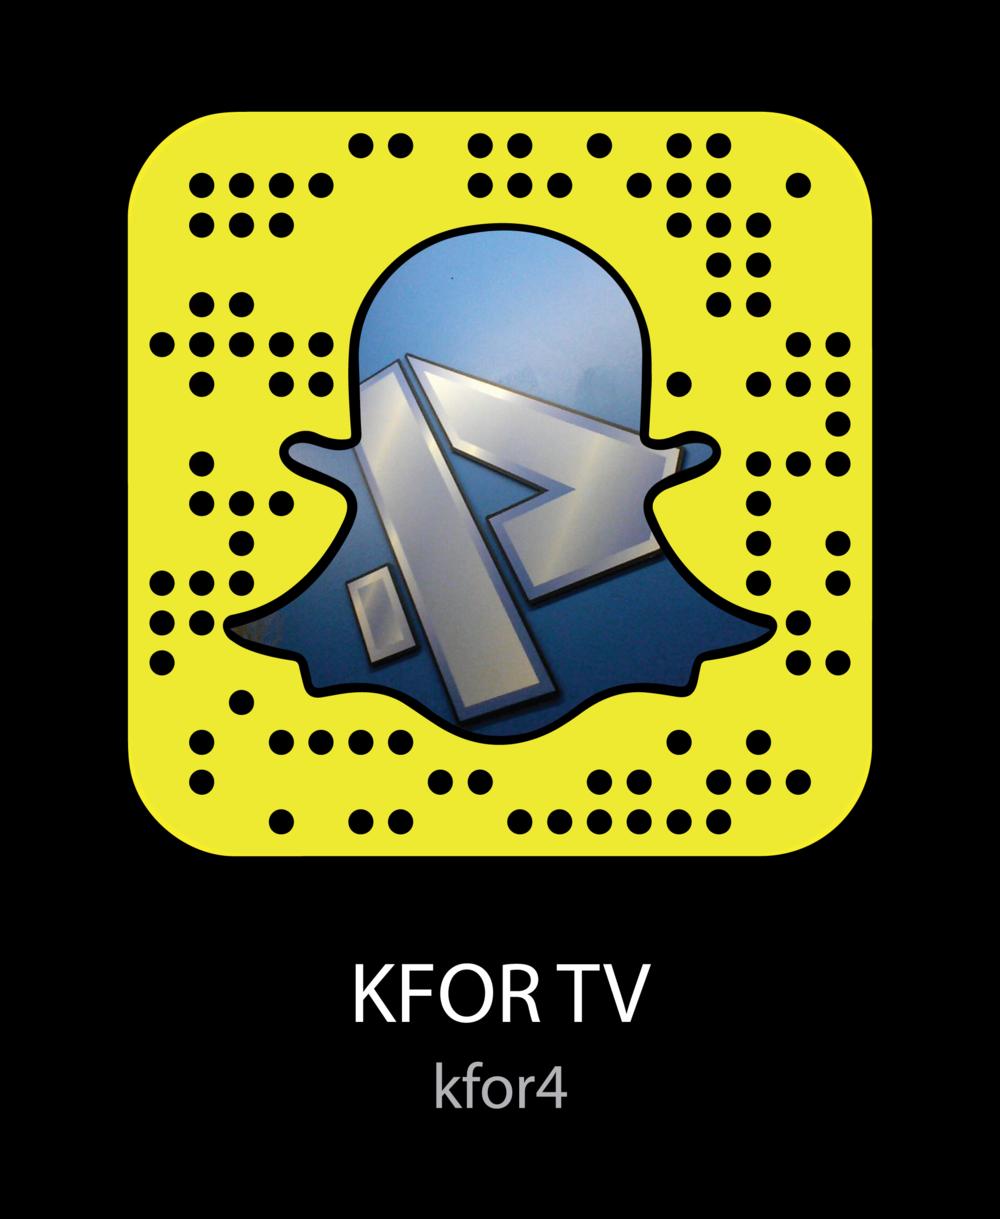 KFOR TV kfor4-News-snapchat-snapcode.png